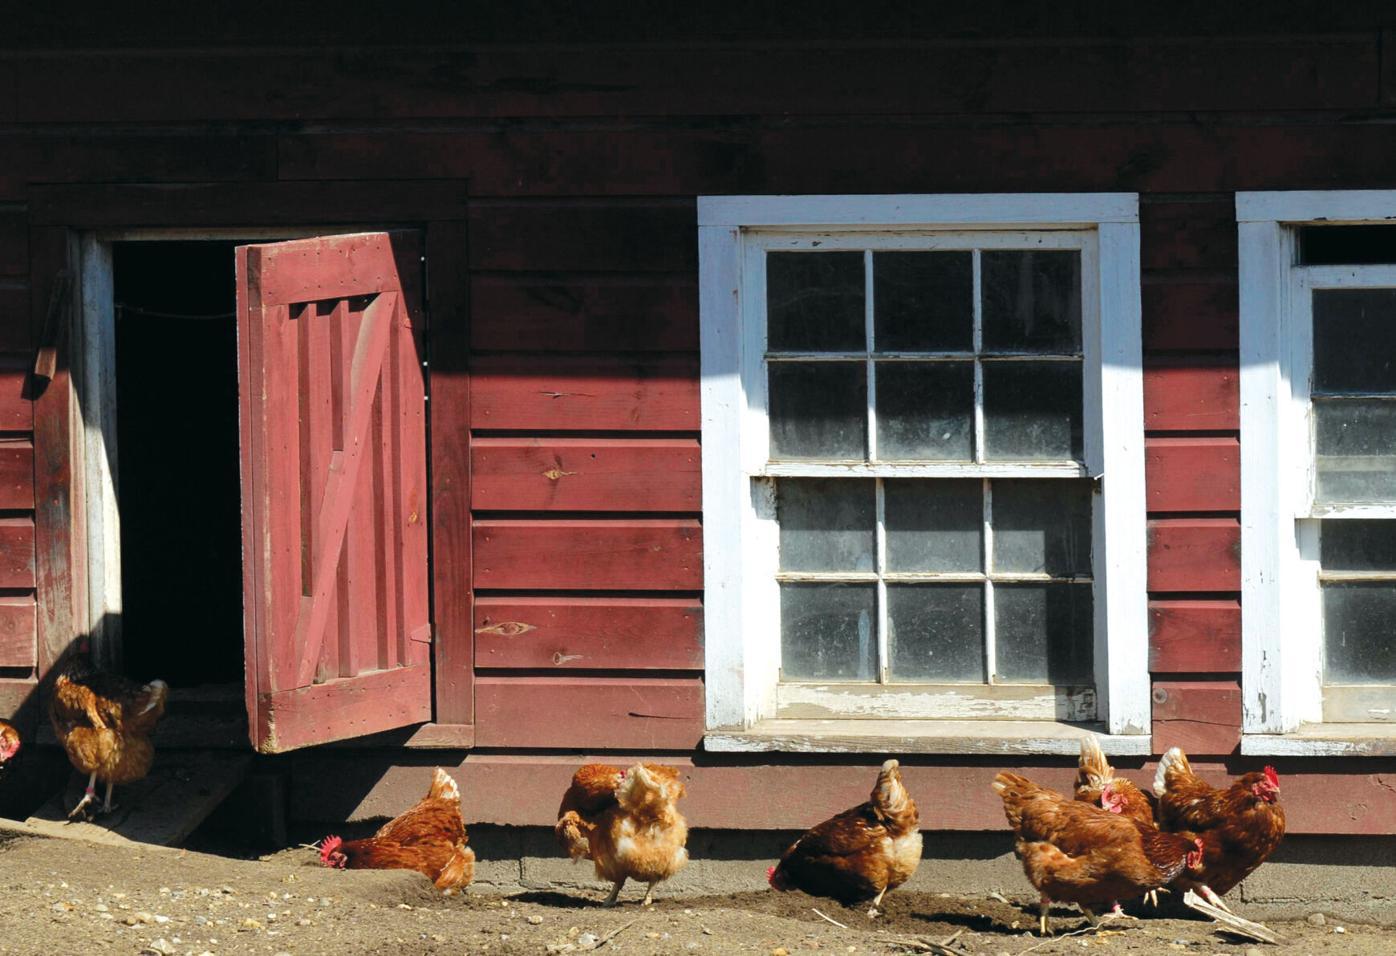 Gould Farm celebrates a century of community in Monterey